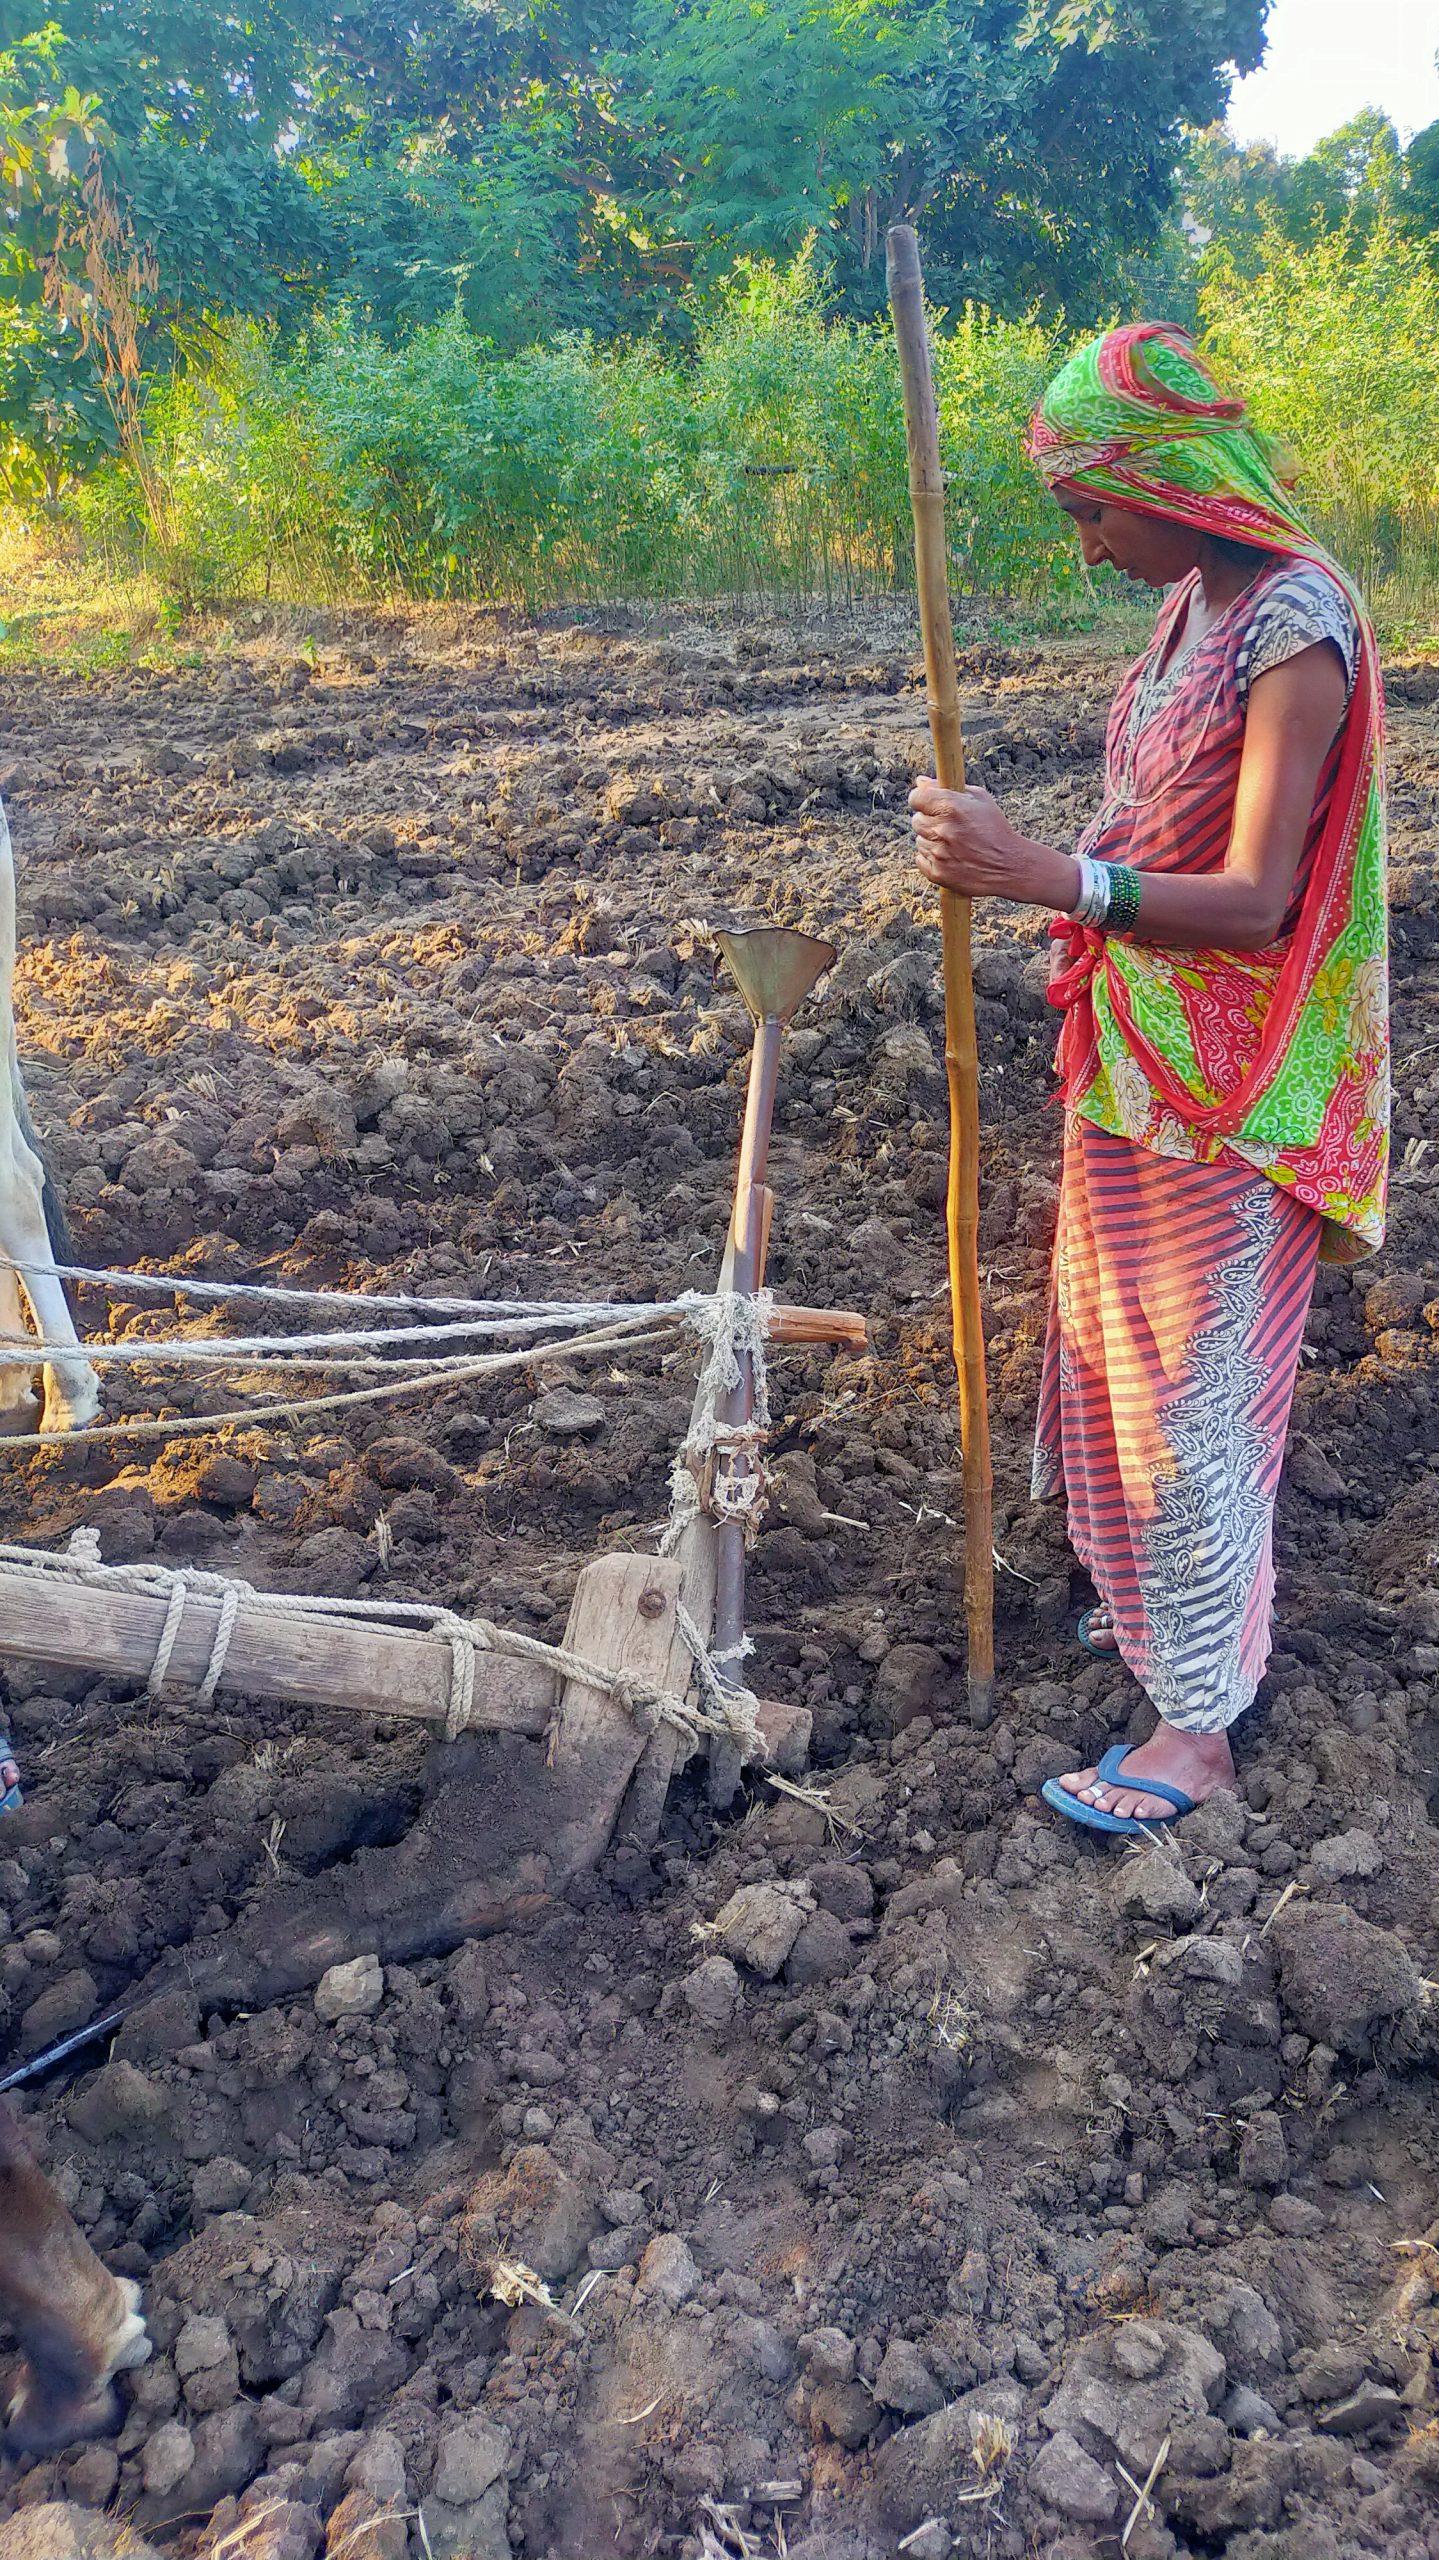 A lady farmer with a plough